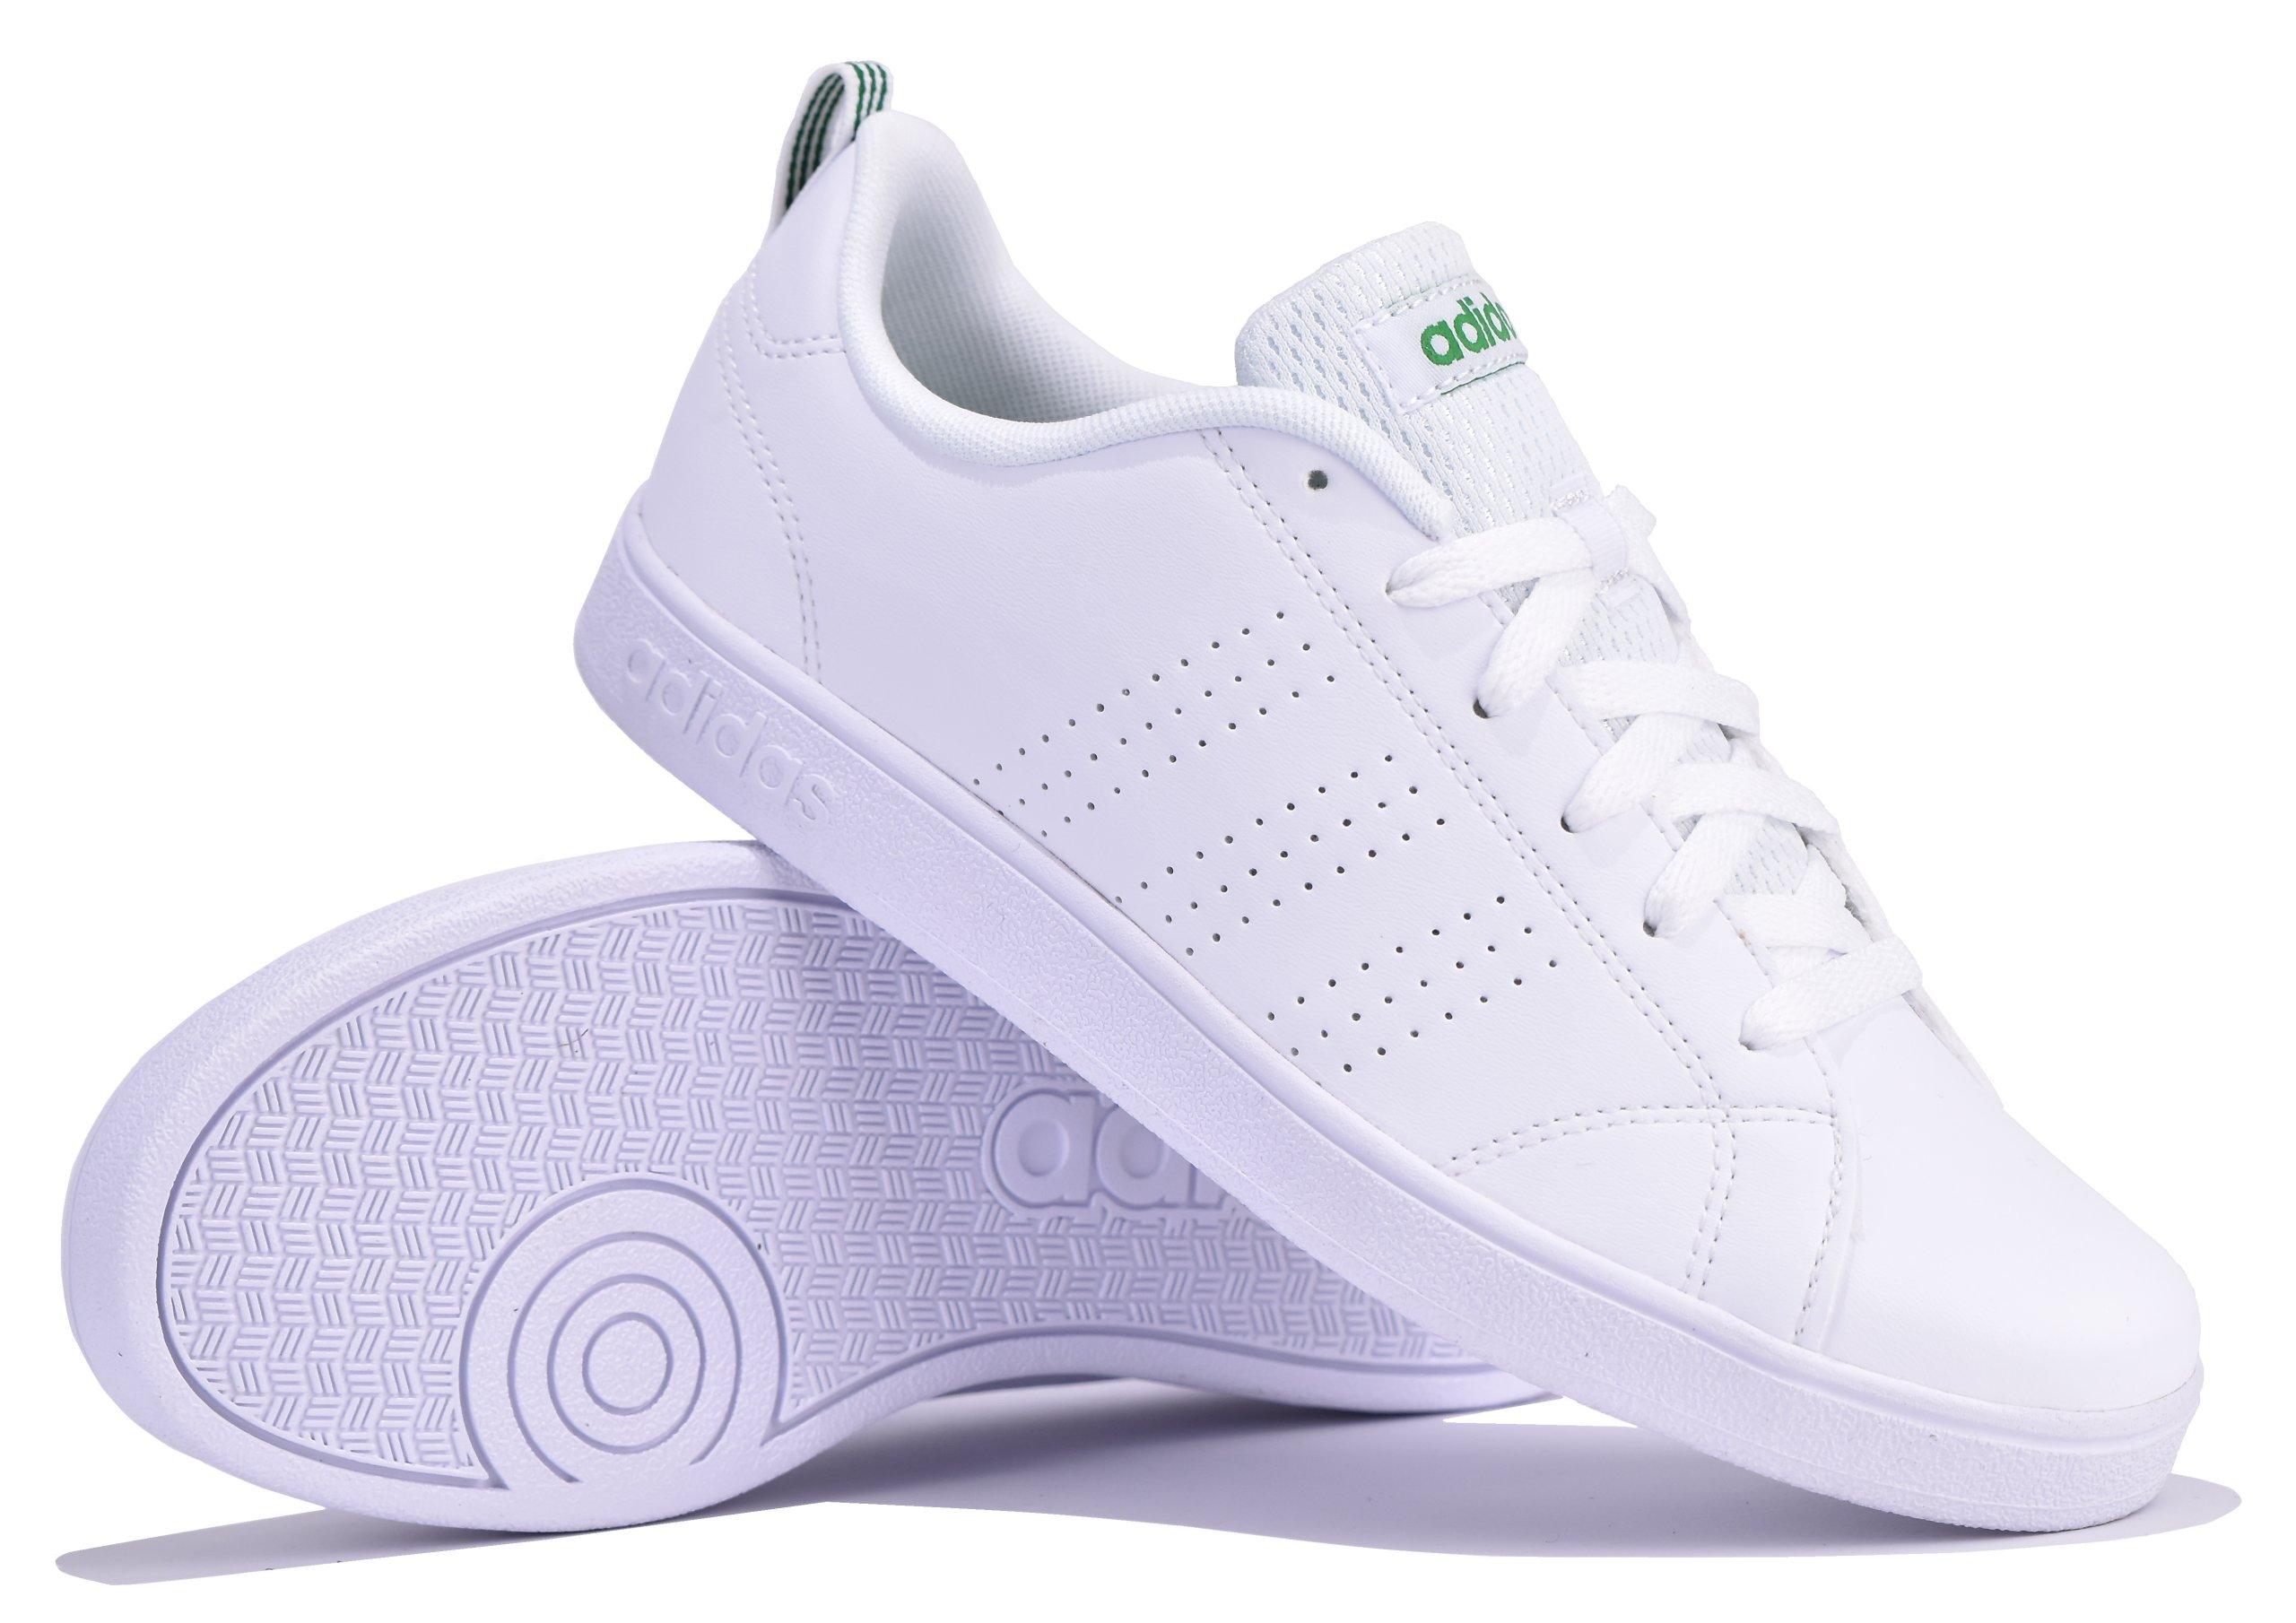 Buty Damskie Adidas VS ADVANTAGE CLEAN AW4884 35,5